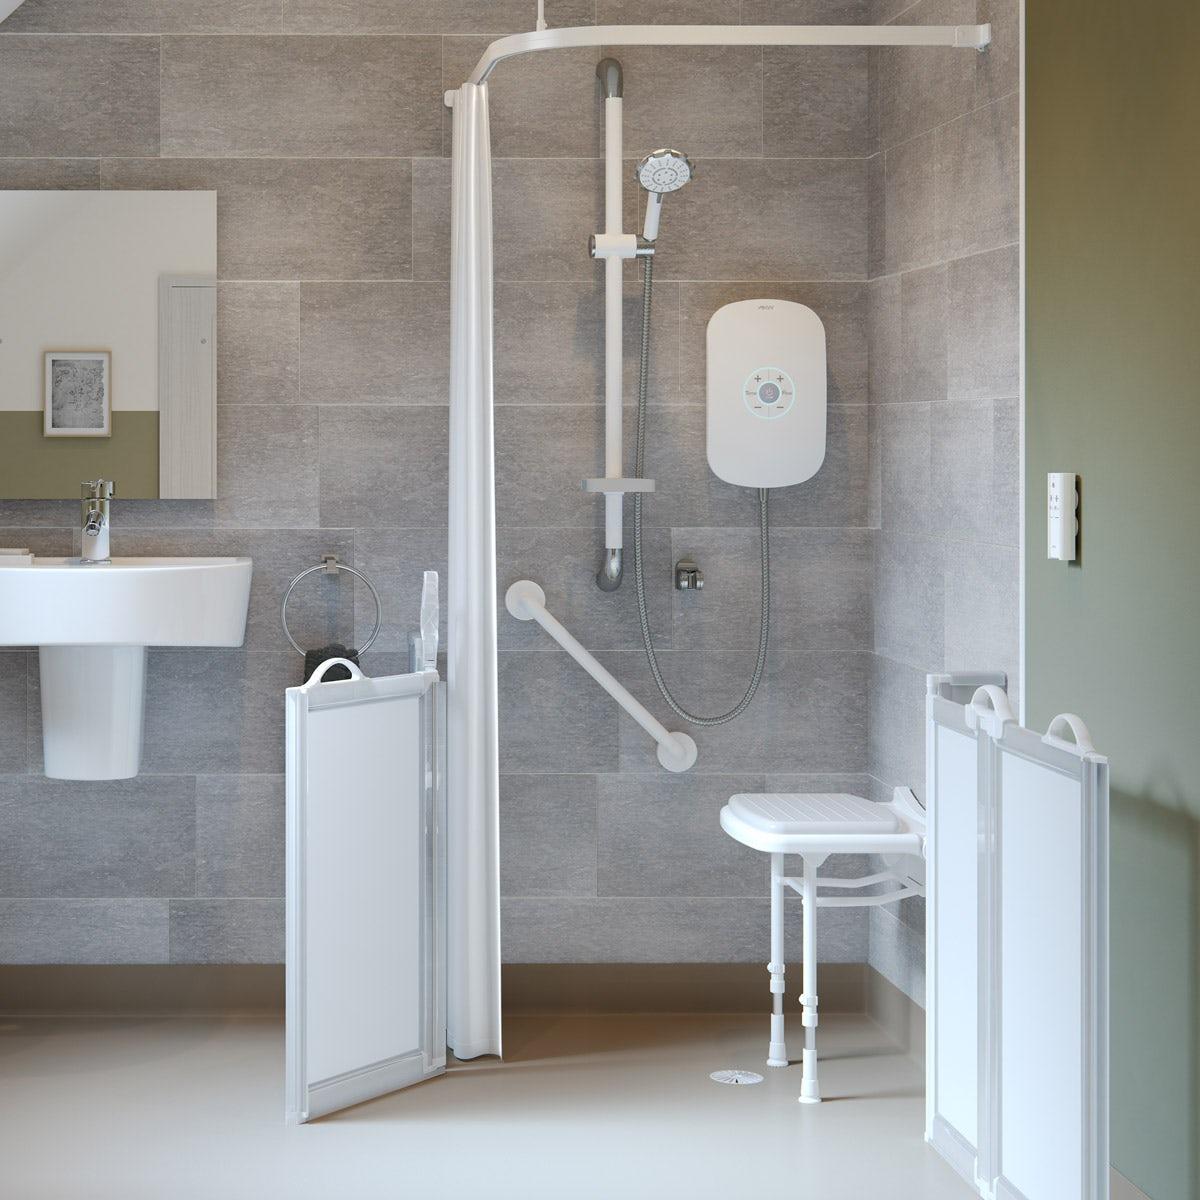 AKW L shaped shower curtain rail 1800 x 820